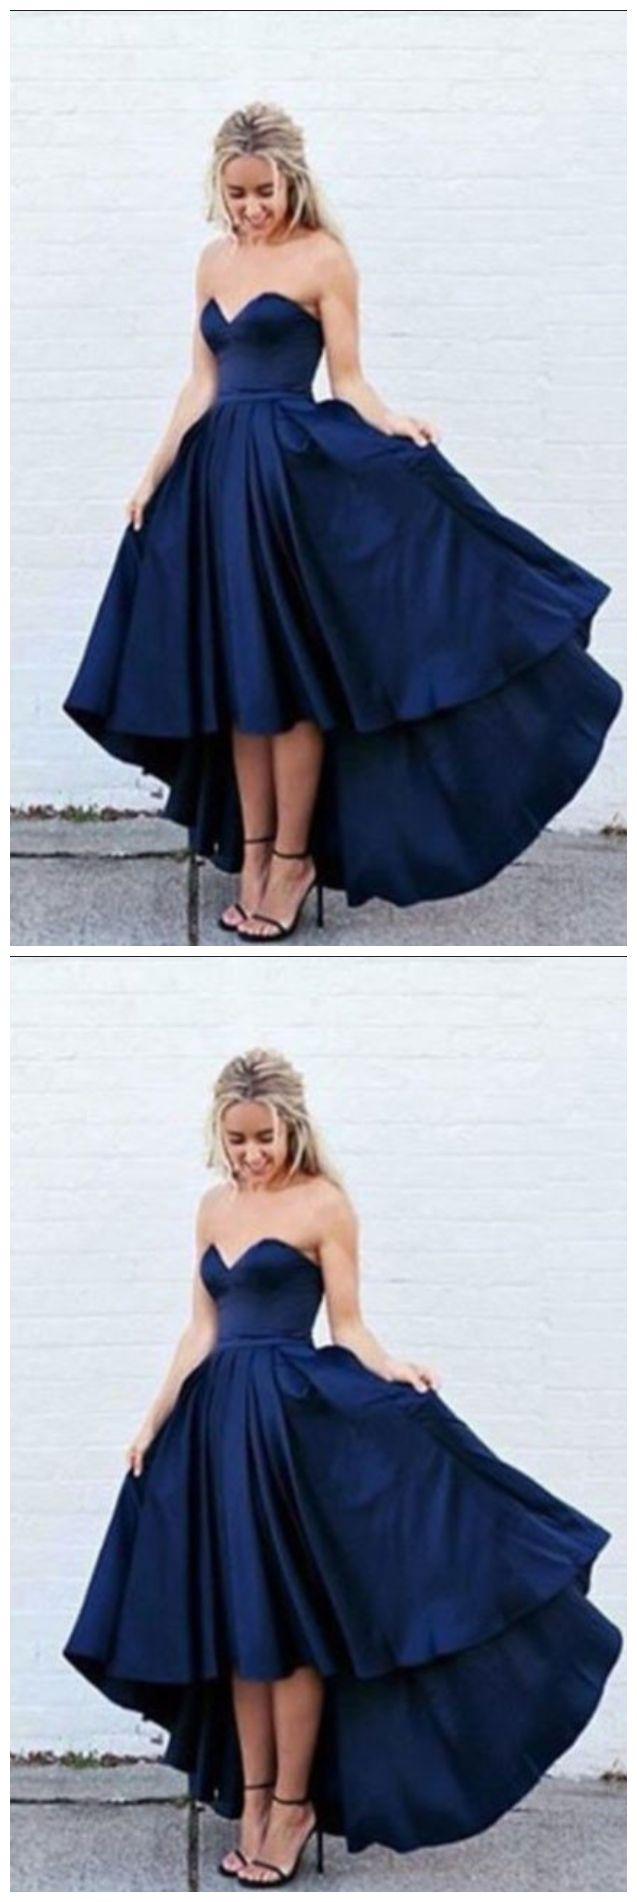 New Arrival simple dark navy blue high-low prom dress, evening dress